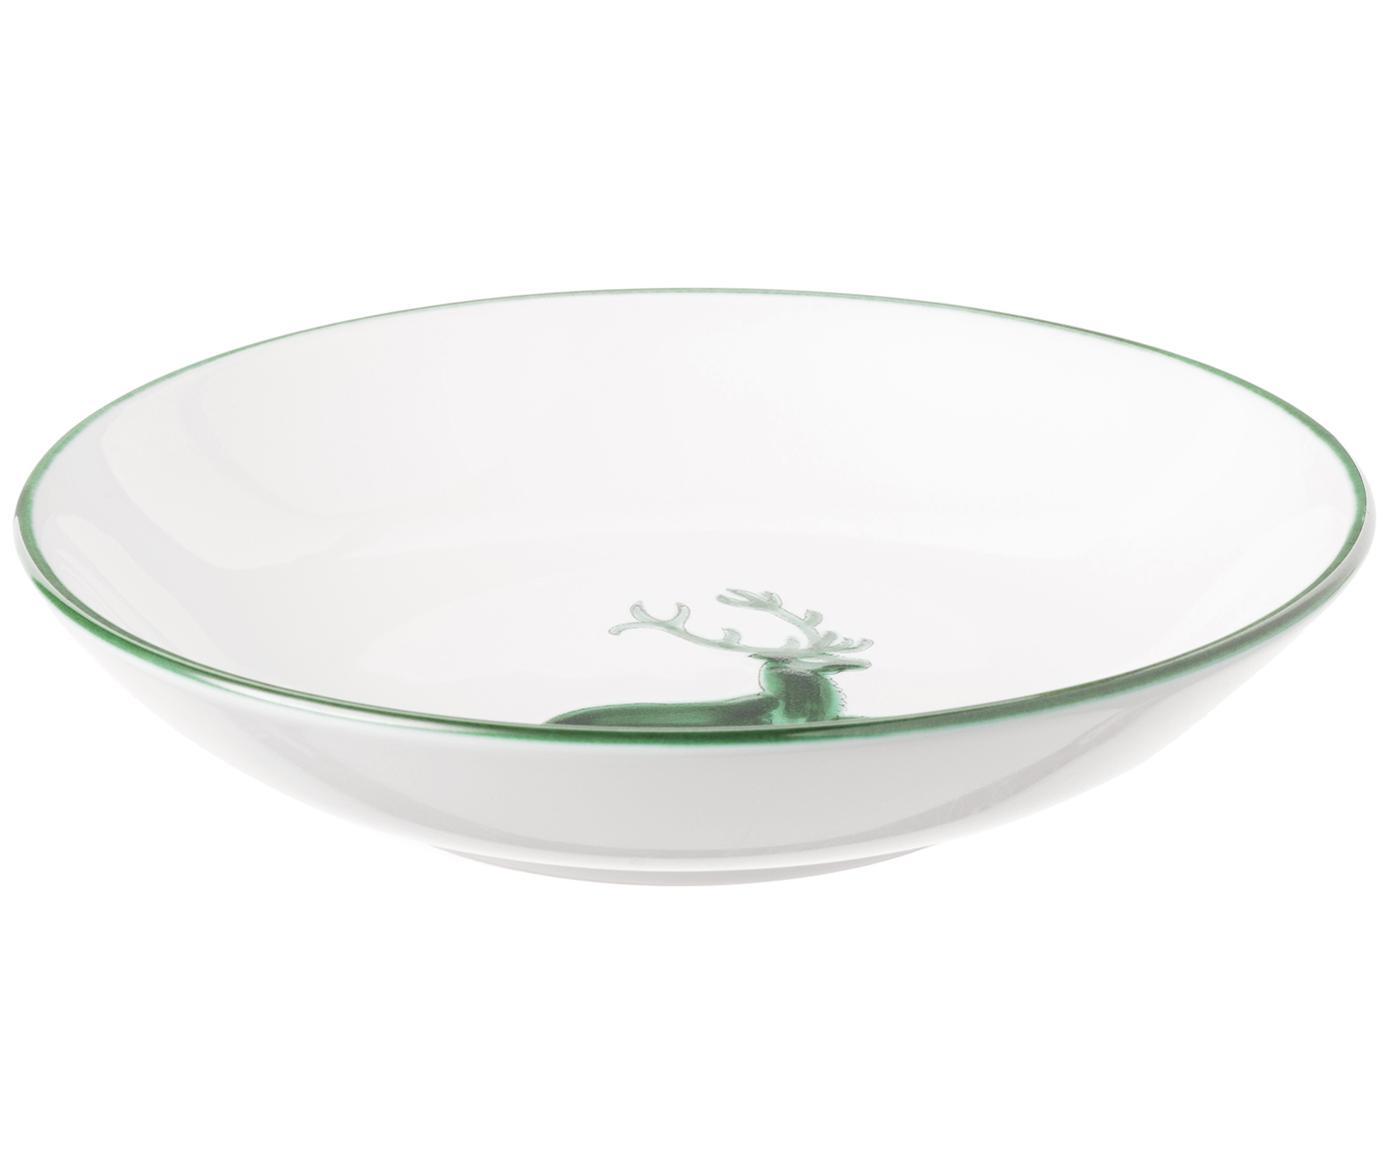 Soepbord Classic Groene Hert, Keramiek, Wit, Ø 20 cm